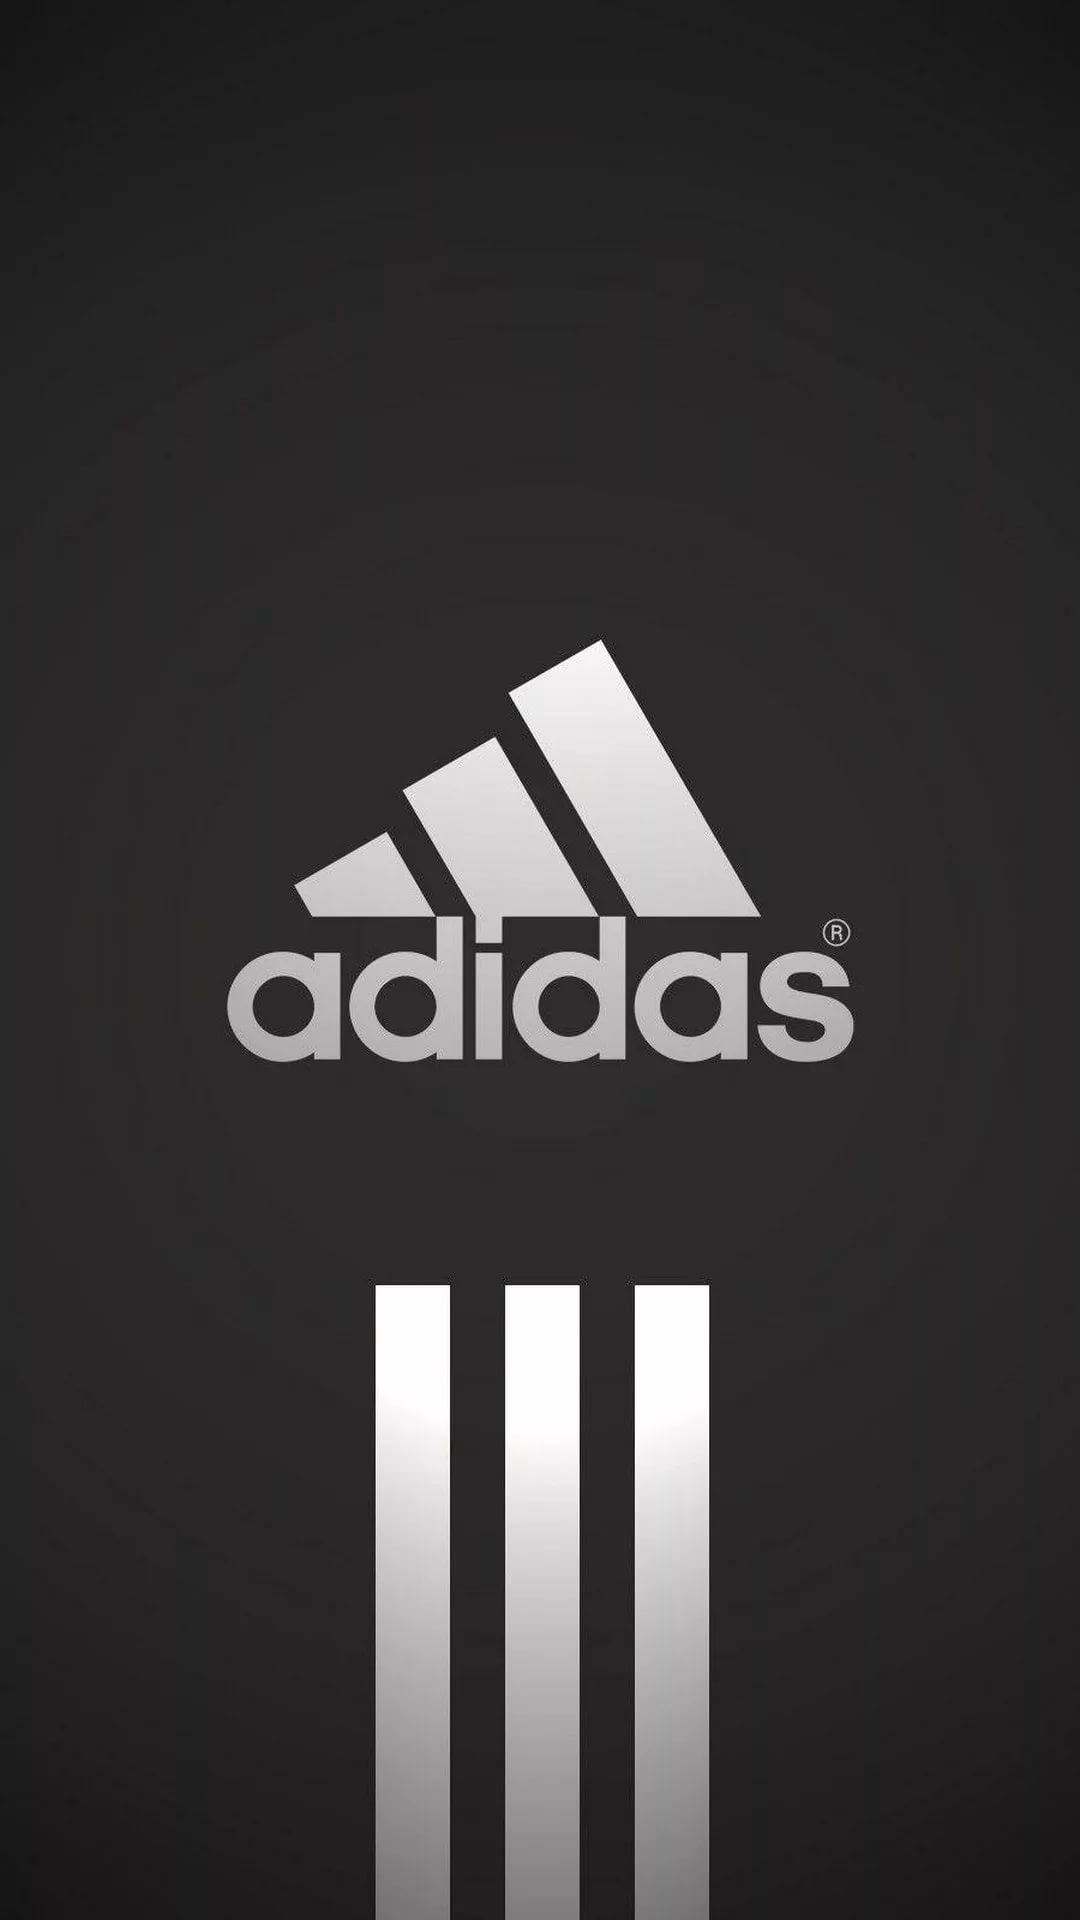 Adidas iPhone wallpaper